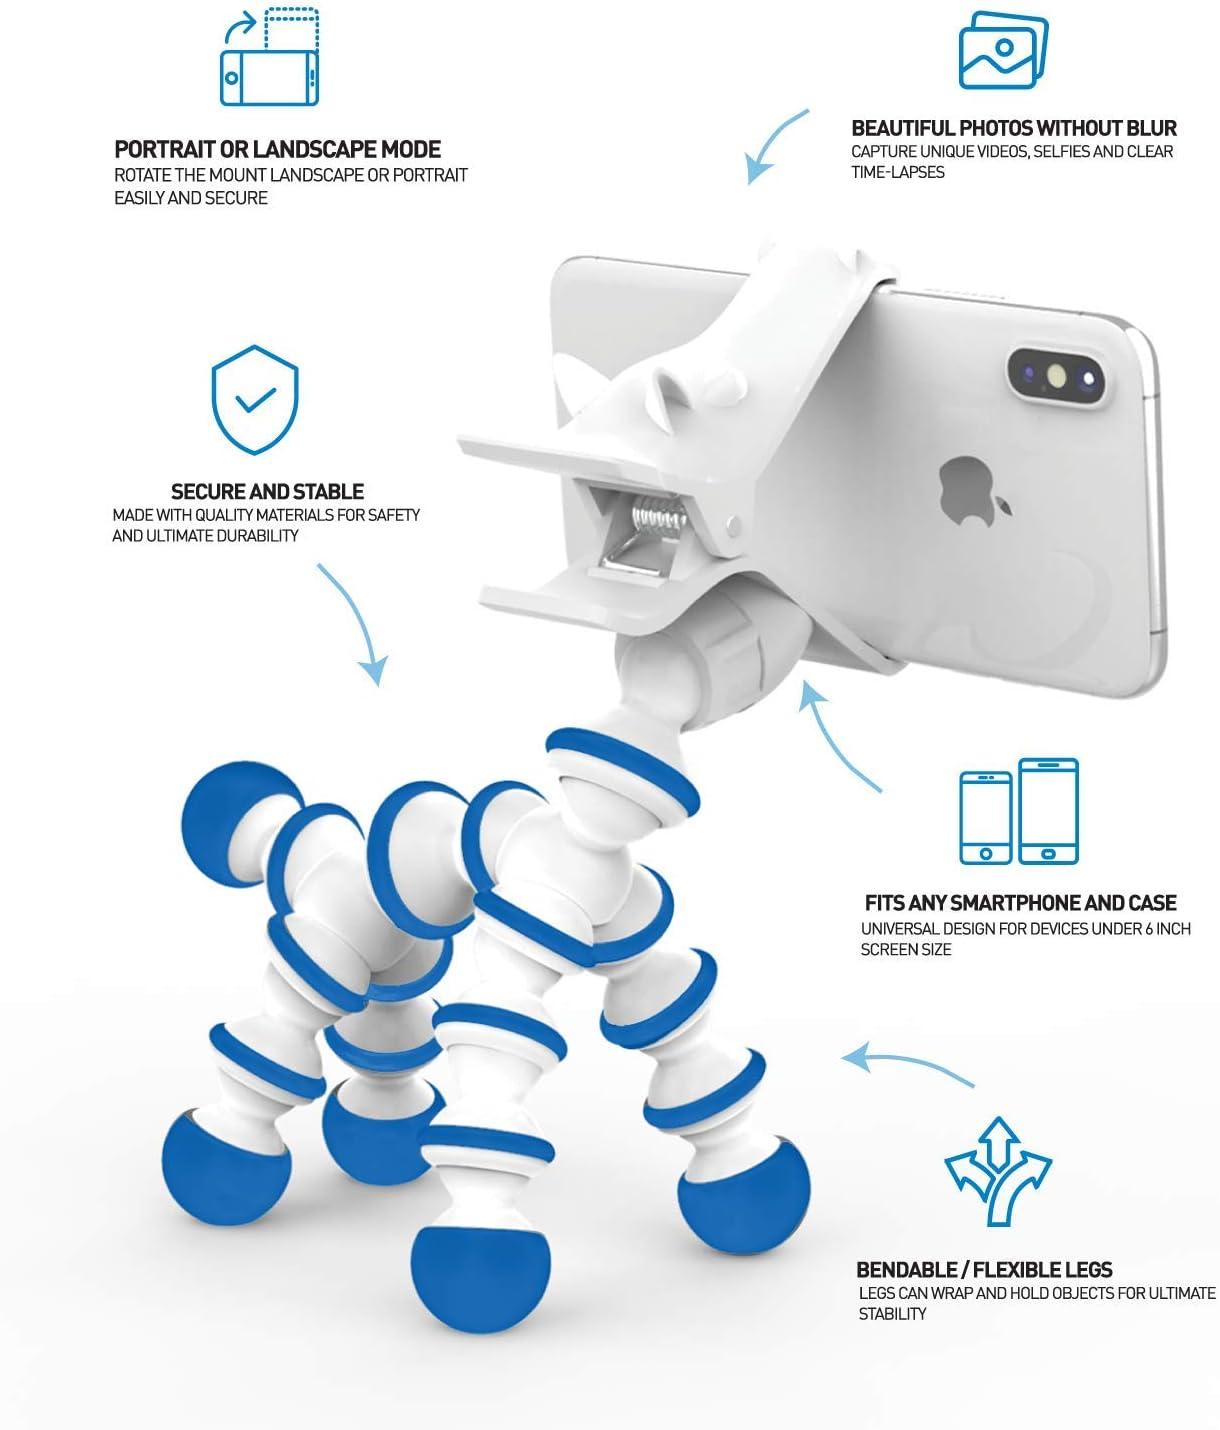 Premier Multi-Flex Smartphone Grip Mount